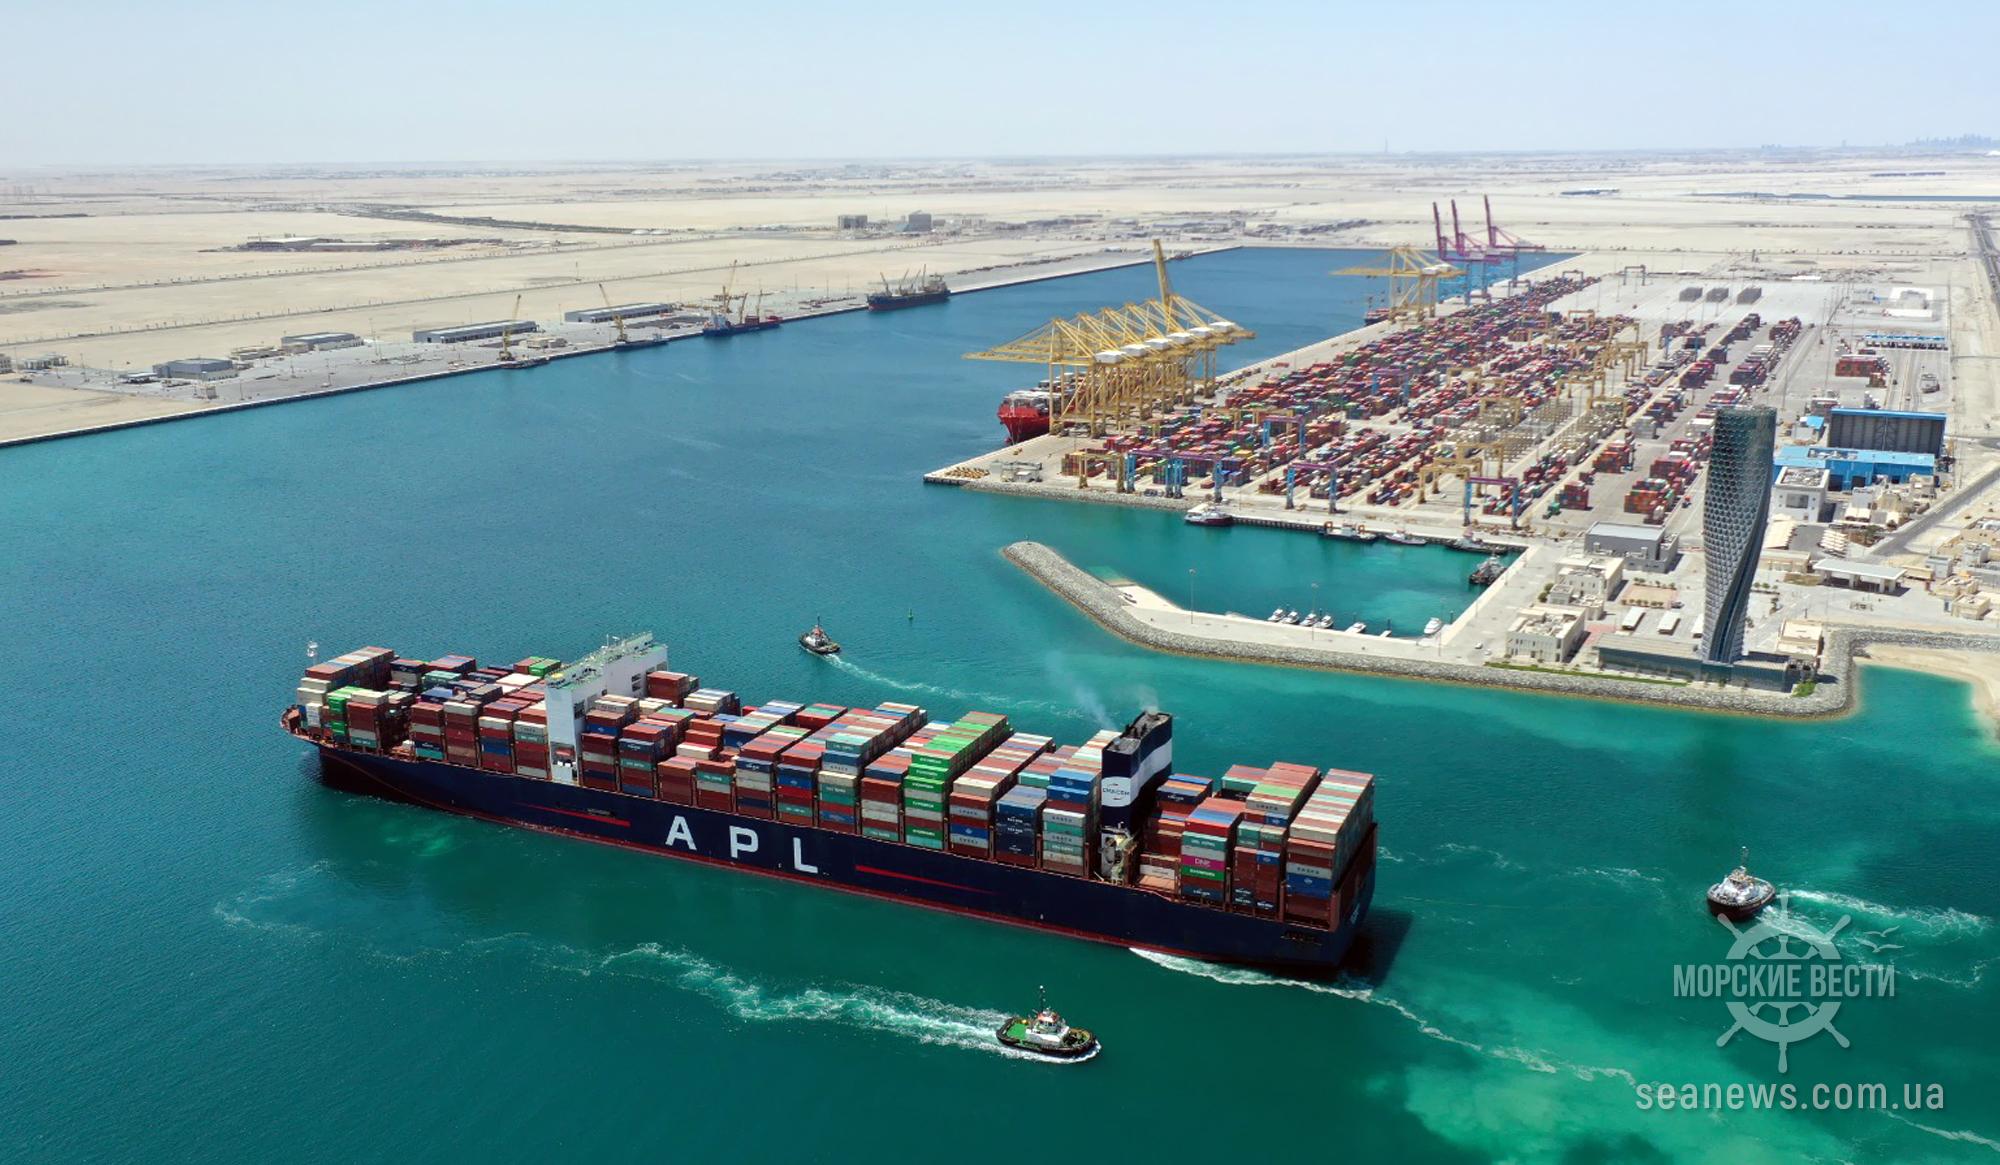 Контейнерооборот в портах Катара за 2020 год вырос на 8%